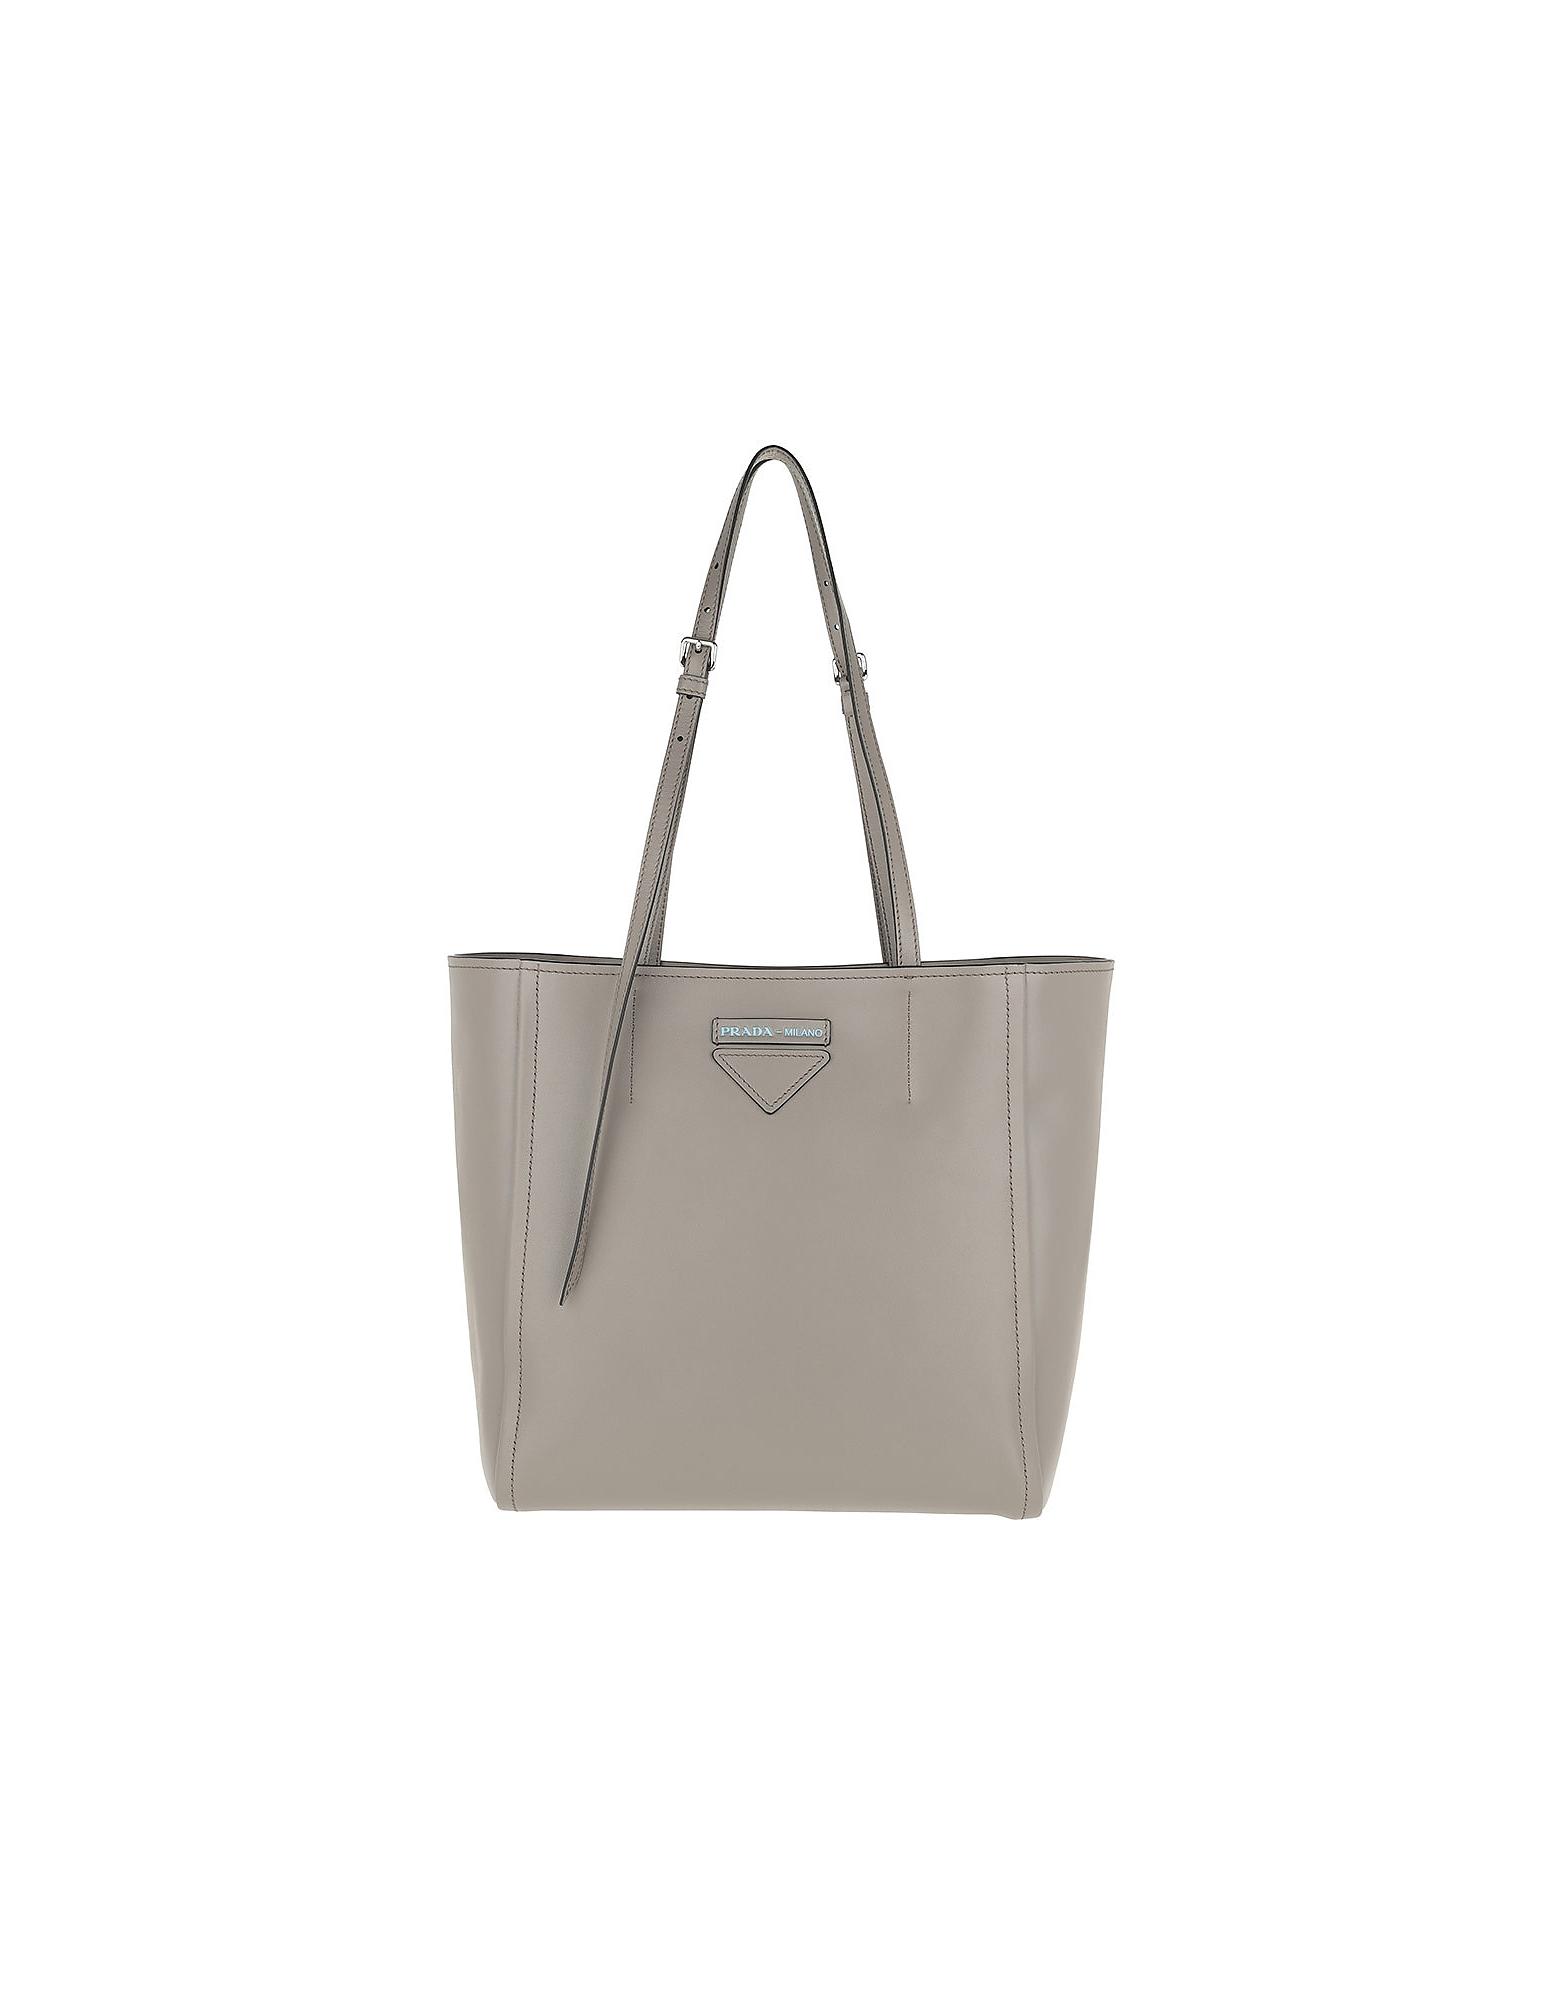 497f6ff38f96 Prada Logo Tote Bag Rivets Leather Argilla/Nero In Grey | ModeSens